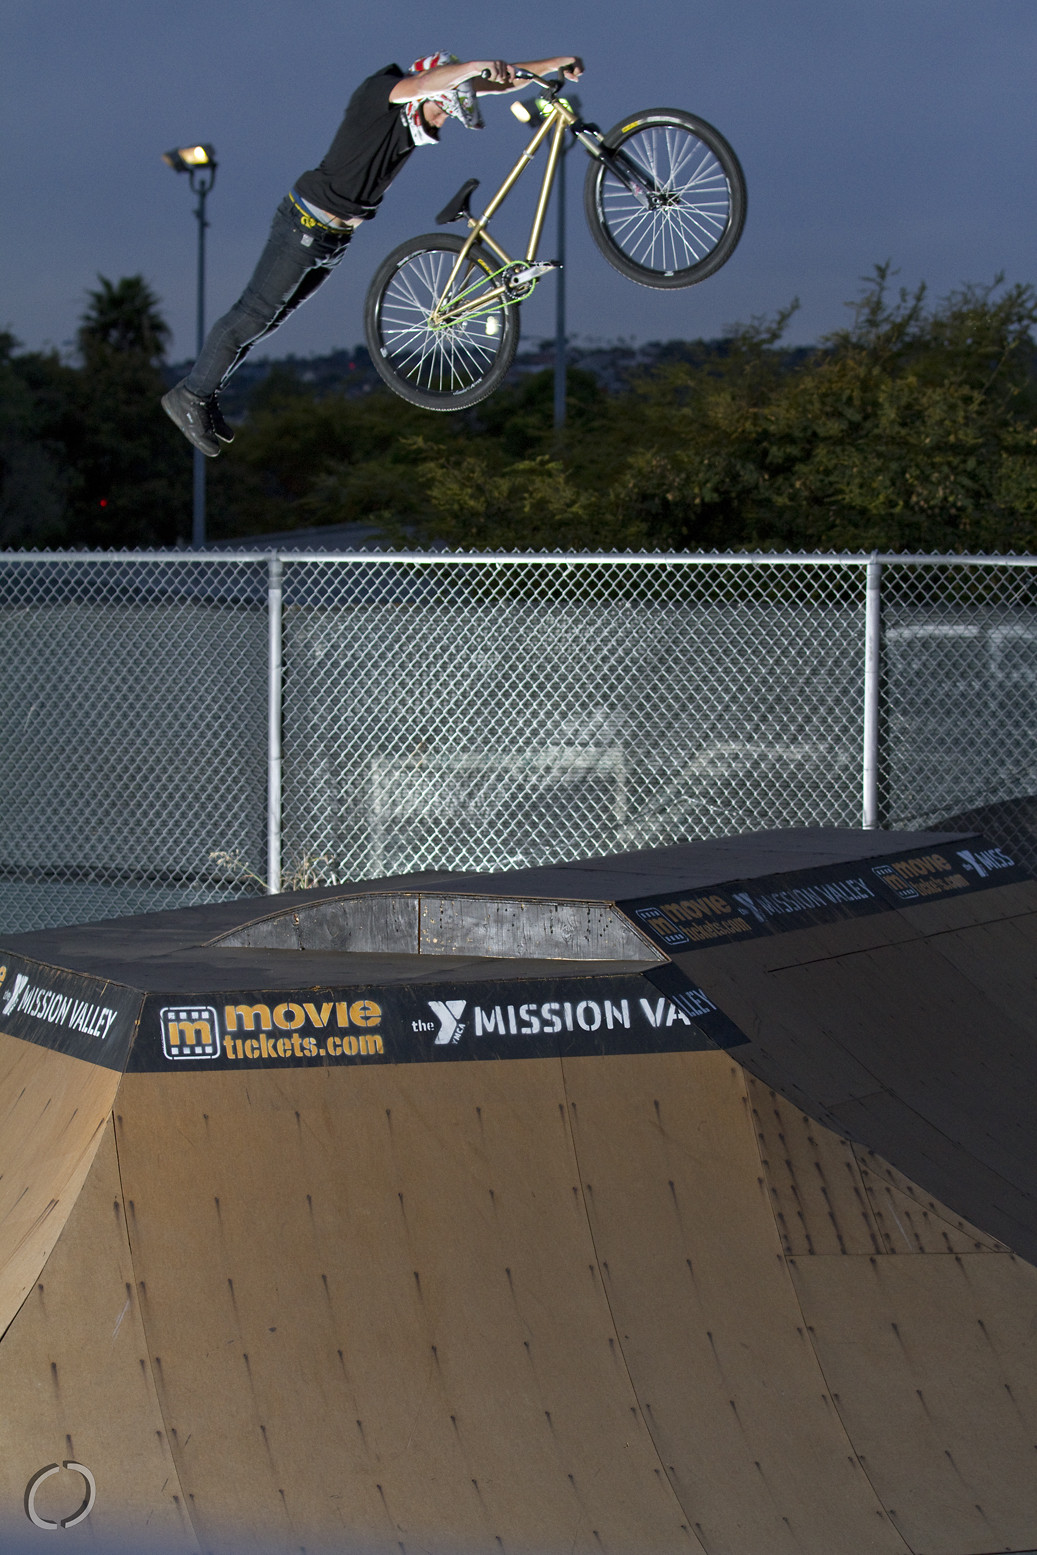 Kevin Sorchetti - Captures by Carman - Mountain Biking Pictures - Vital MTB